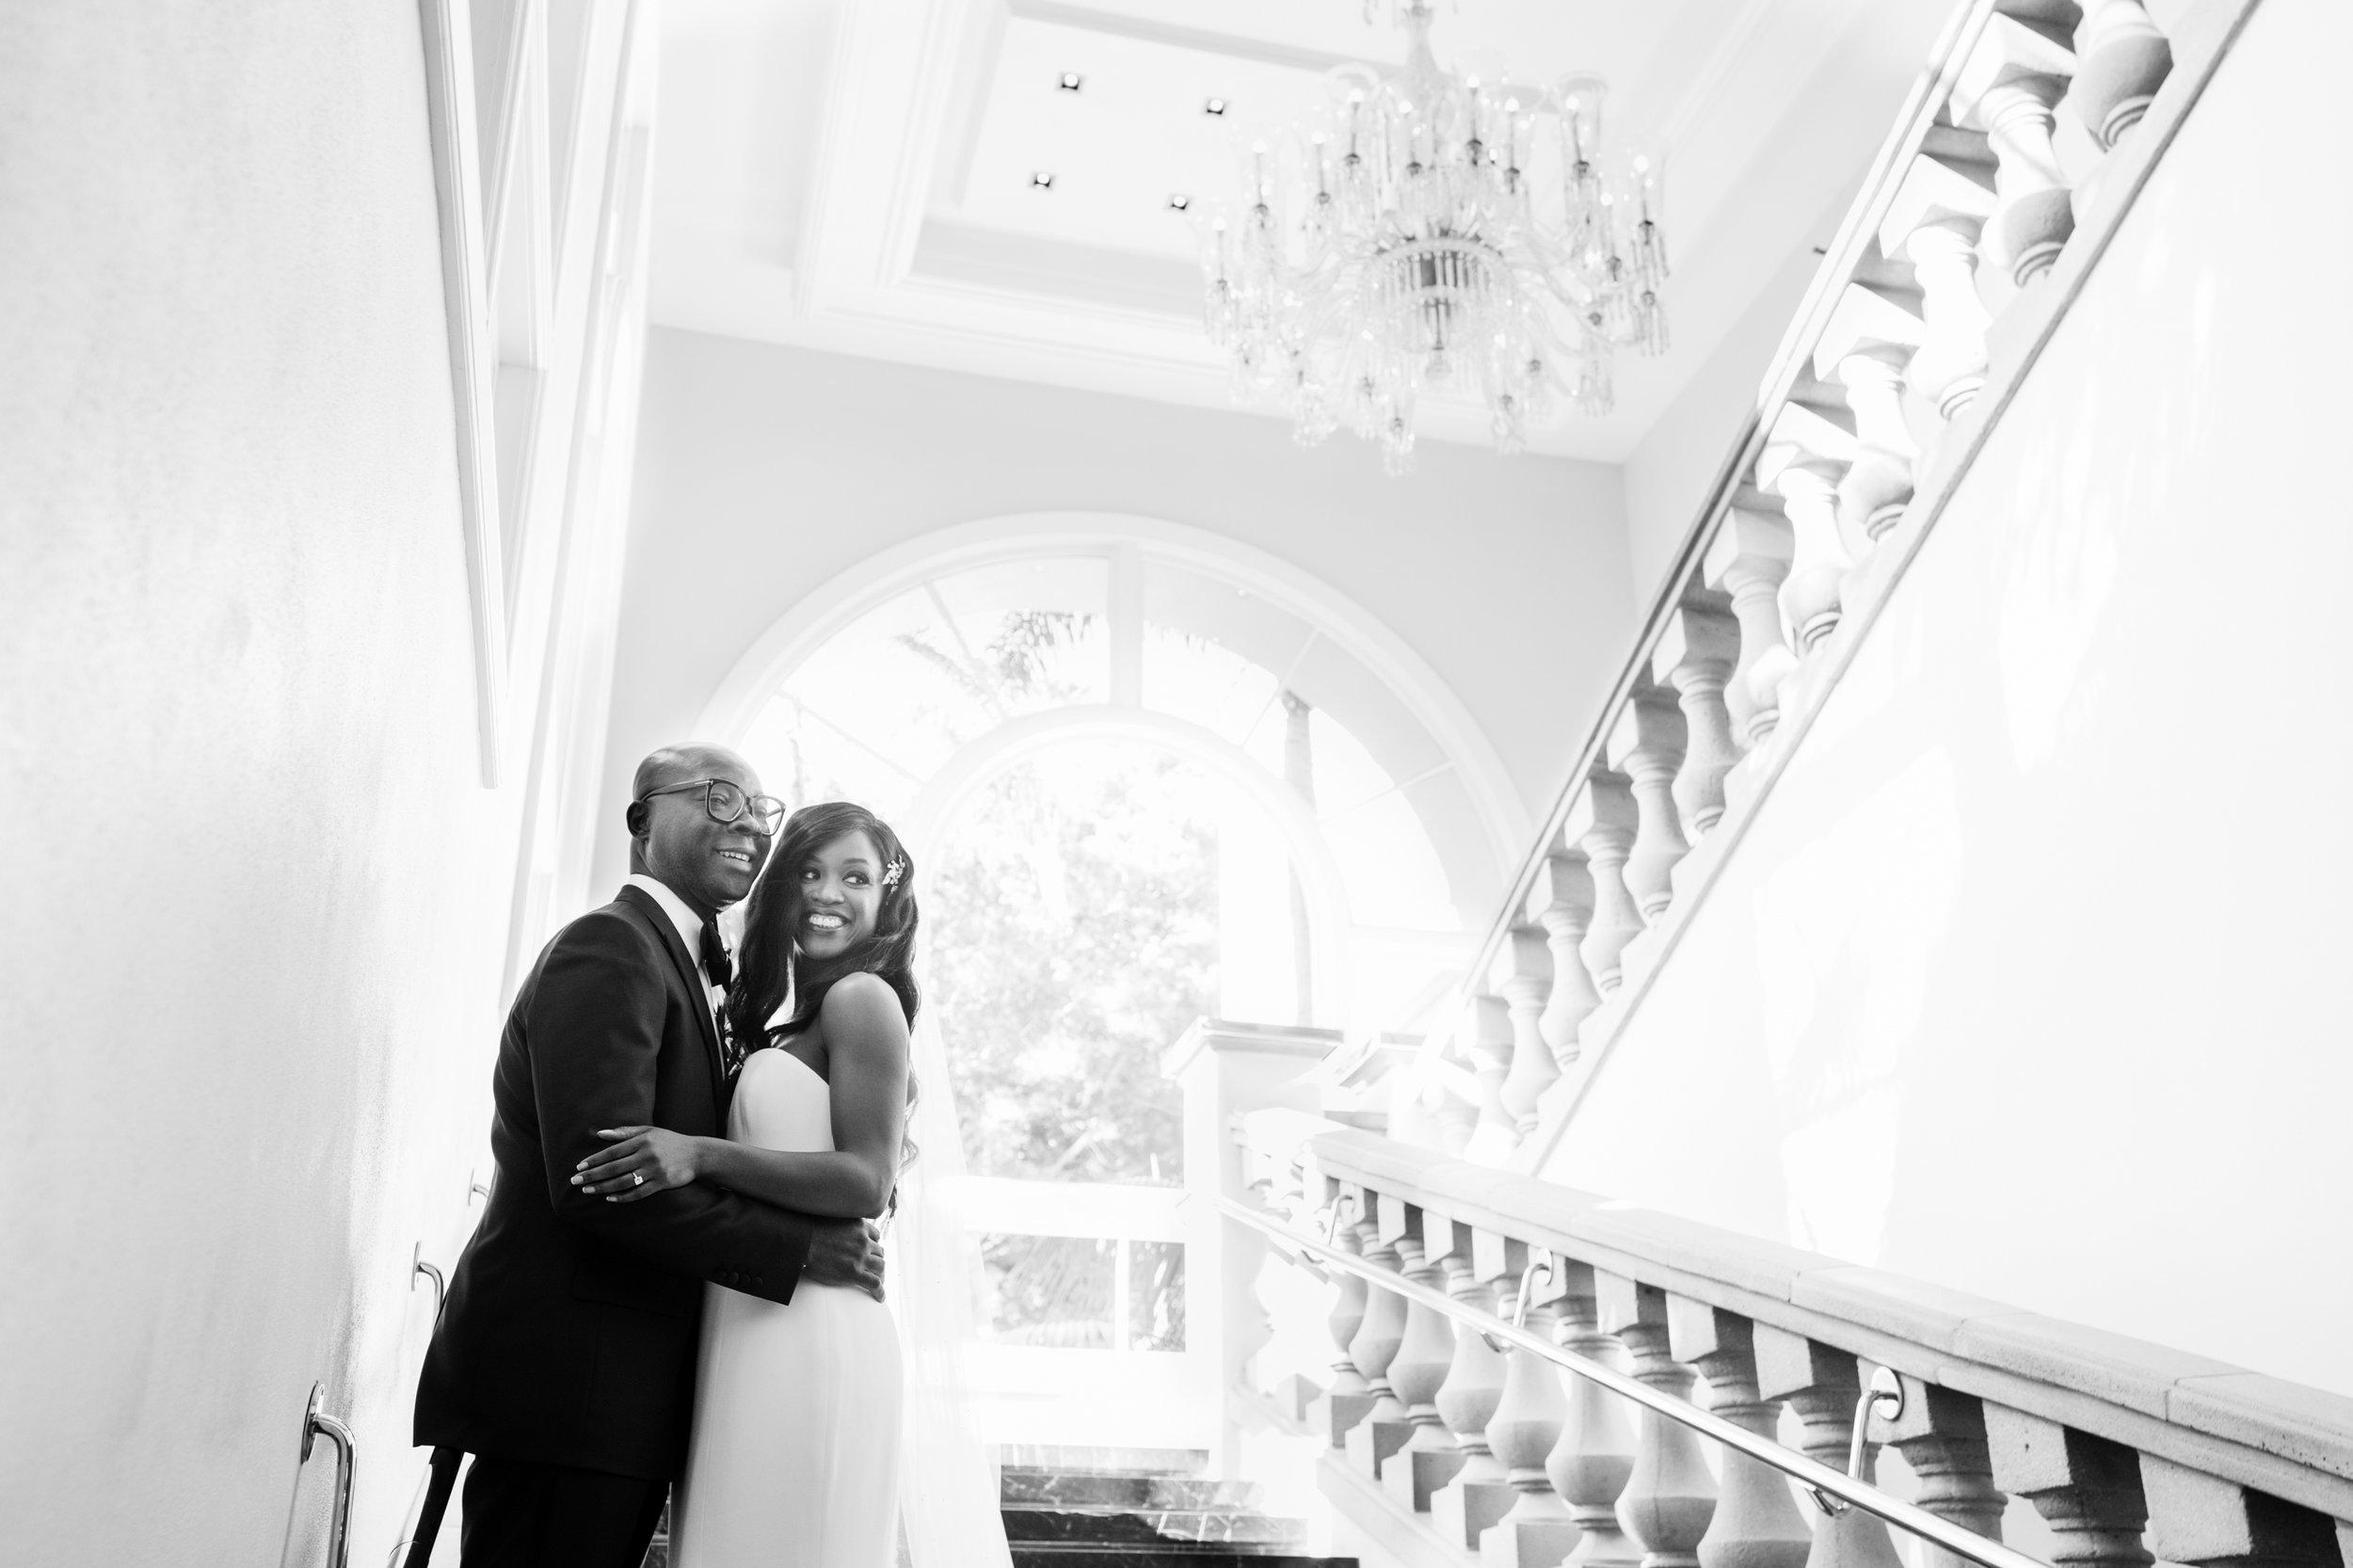 ritz-carlton-laguna-niguel-wedding-sonya_0096.JPG